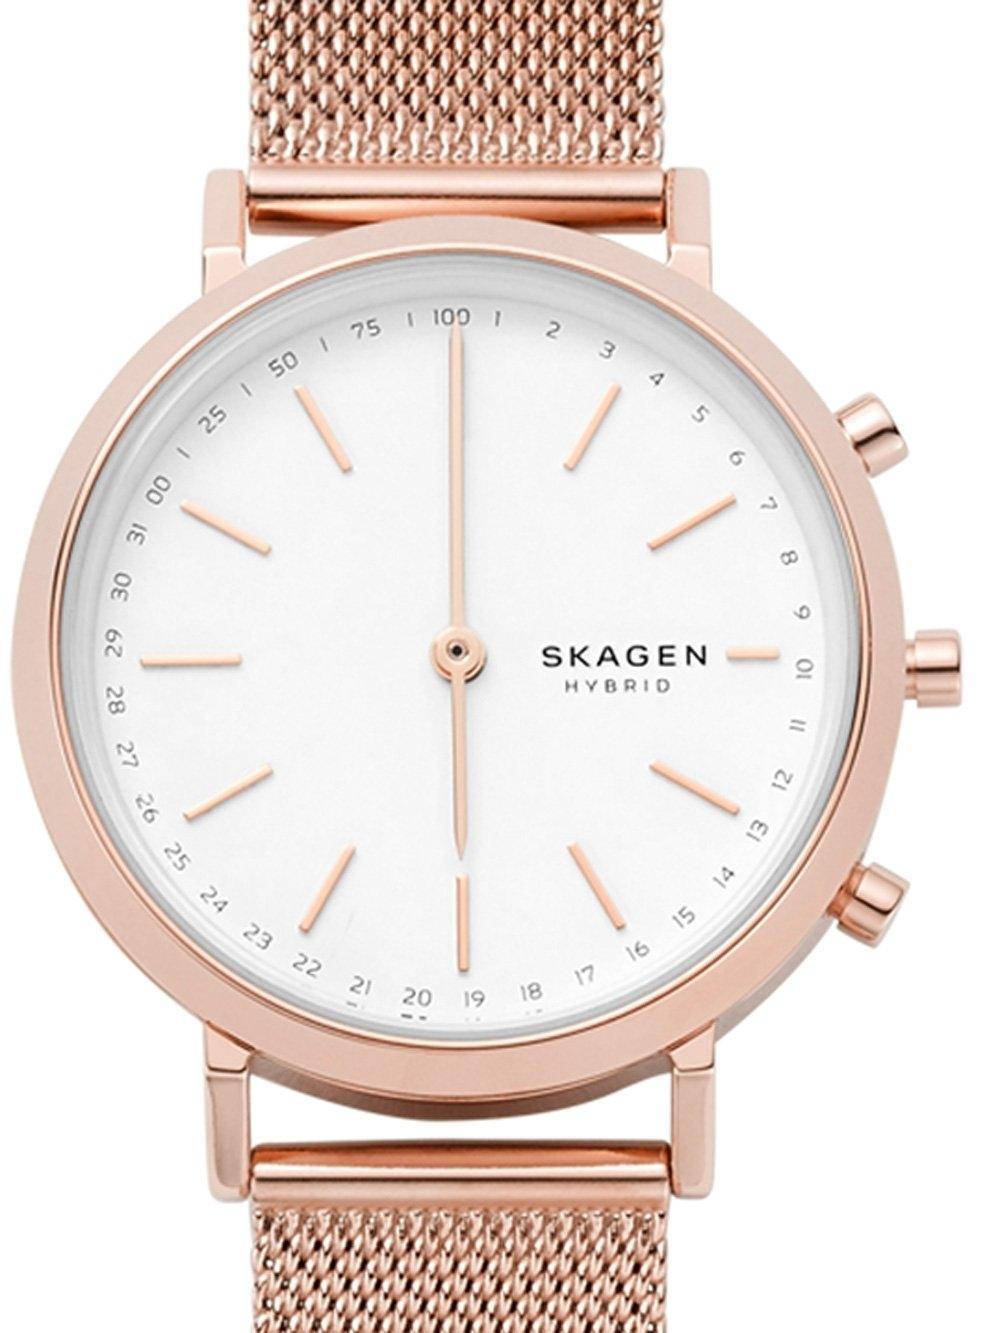 ceas de dama skagen skt1411 hald hybrid smartwatch 34mm 3atm